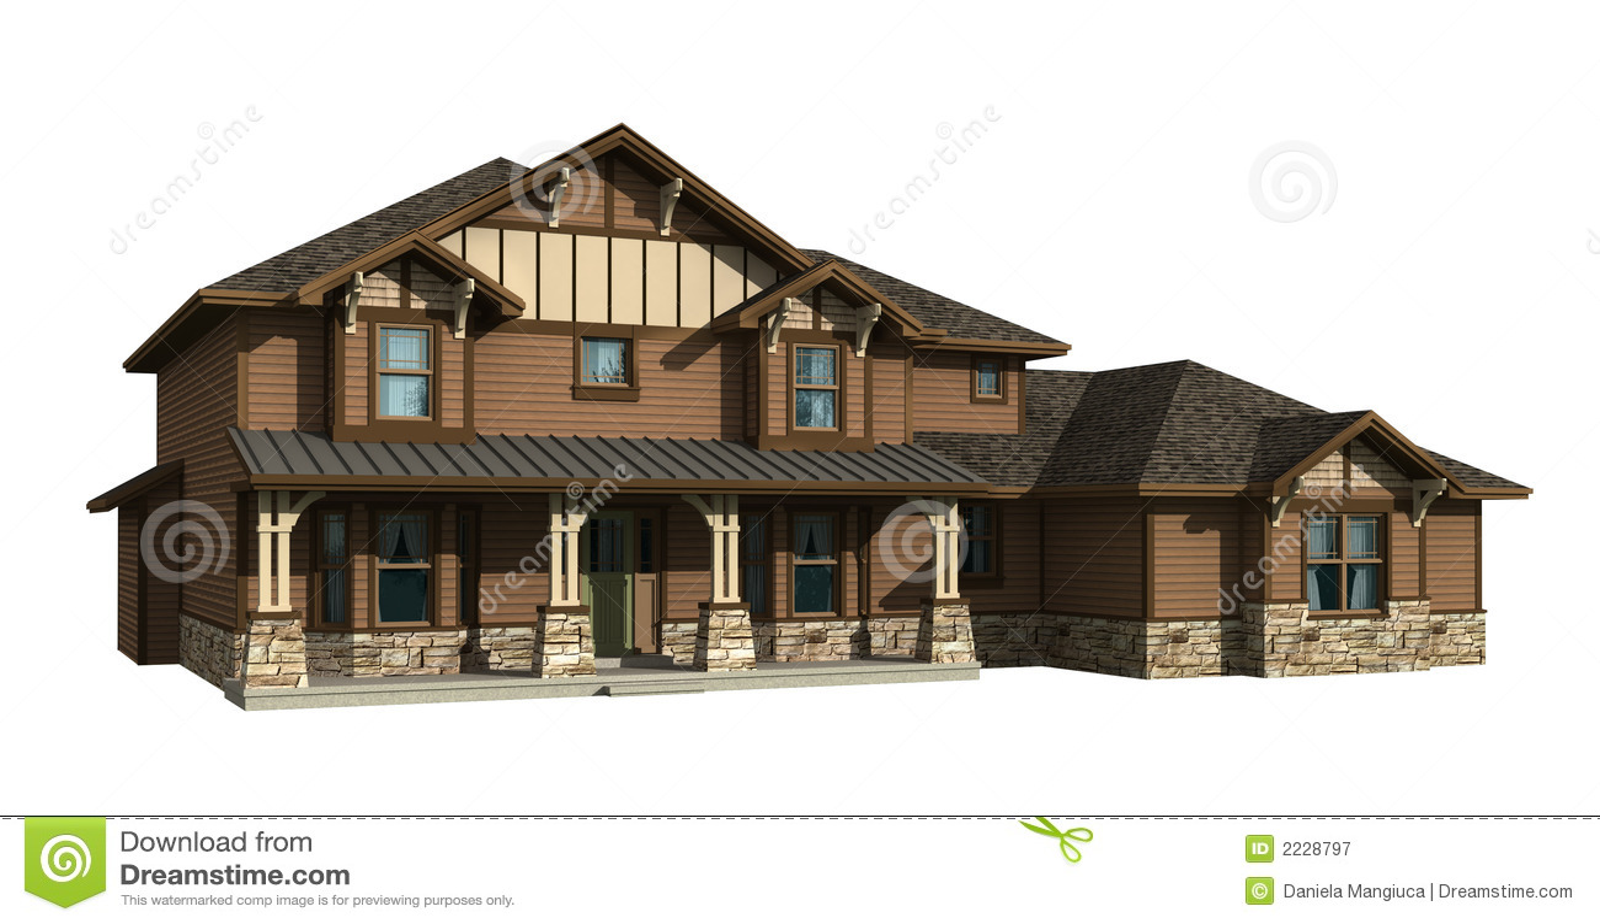 3d max 3d модели зданий westerninstruction.